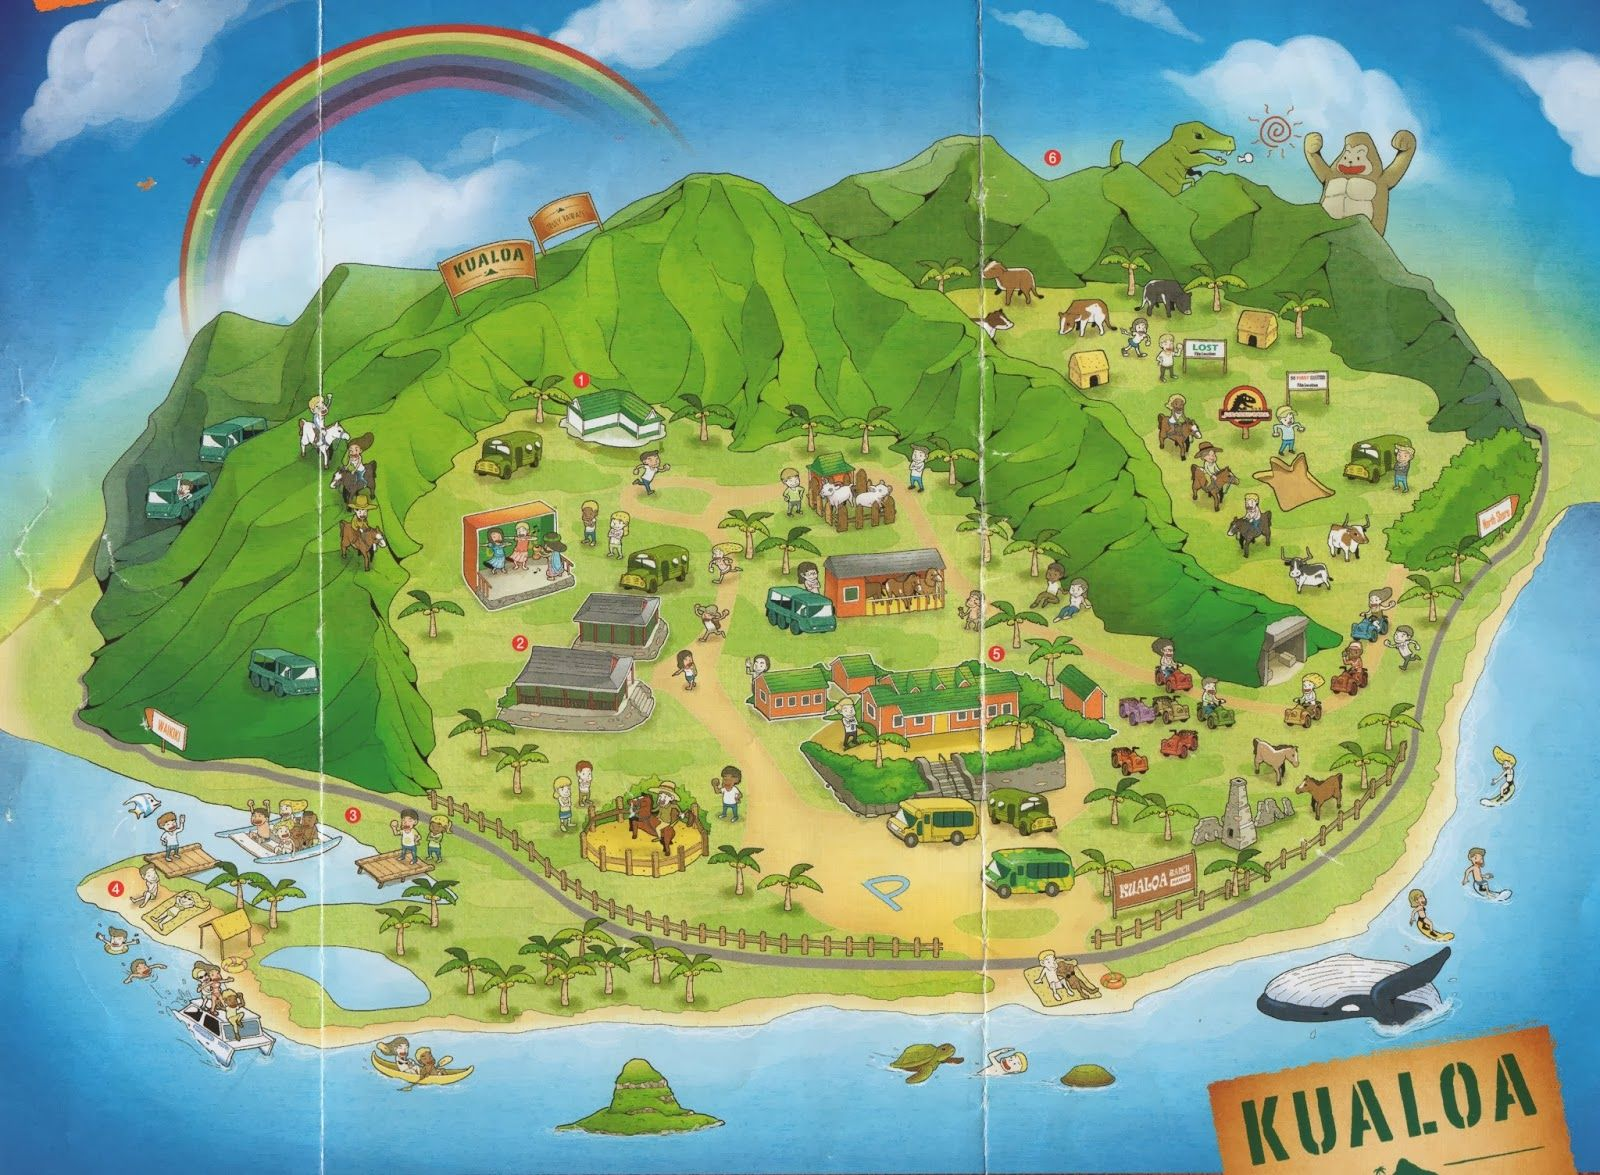 kualoa map | Wedding program | Kualoa ranch, Oahu map, Oahu on h-1 freeway map, valley of the temples map, bellows air force station map, halona blowhole map, old pali road map, oahu map, kaaawa valley map, waimea valley map, kona airport map, honolulu map, kailua map, iolani palace map, oregon convention center map, polynesian cultural center map, parker ranch map, kingdom of hawaii map, chinaman's hat map, niihau map, hawaii convention center map,